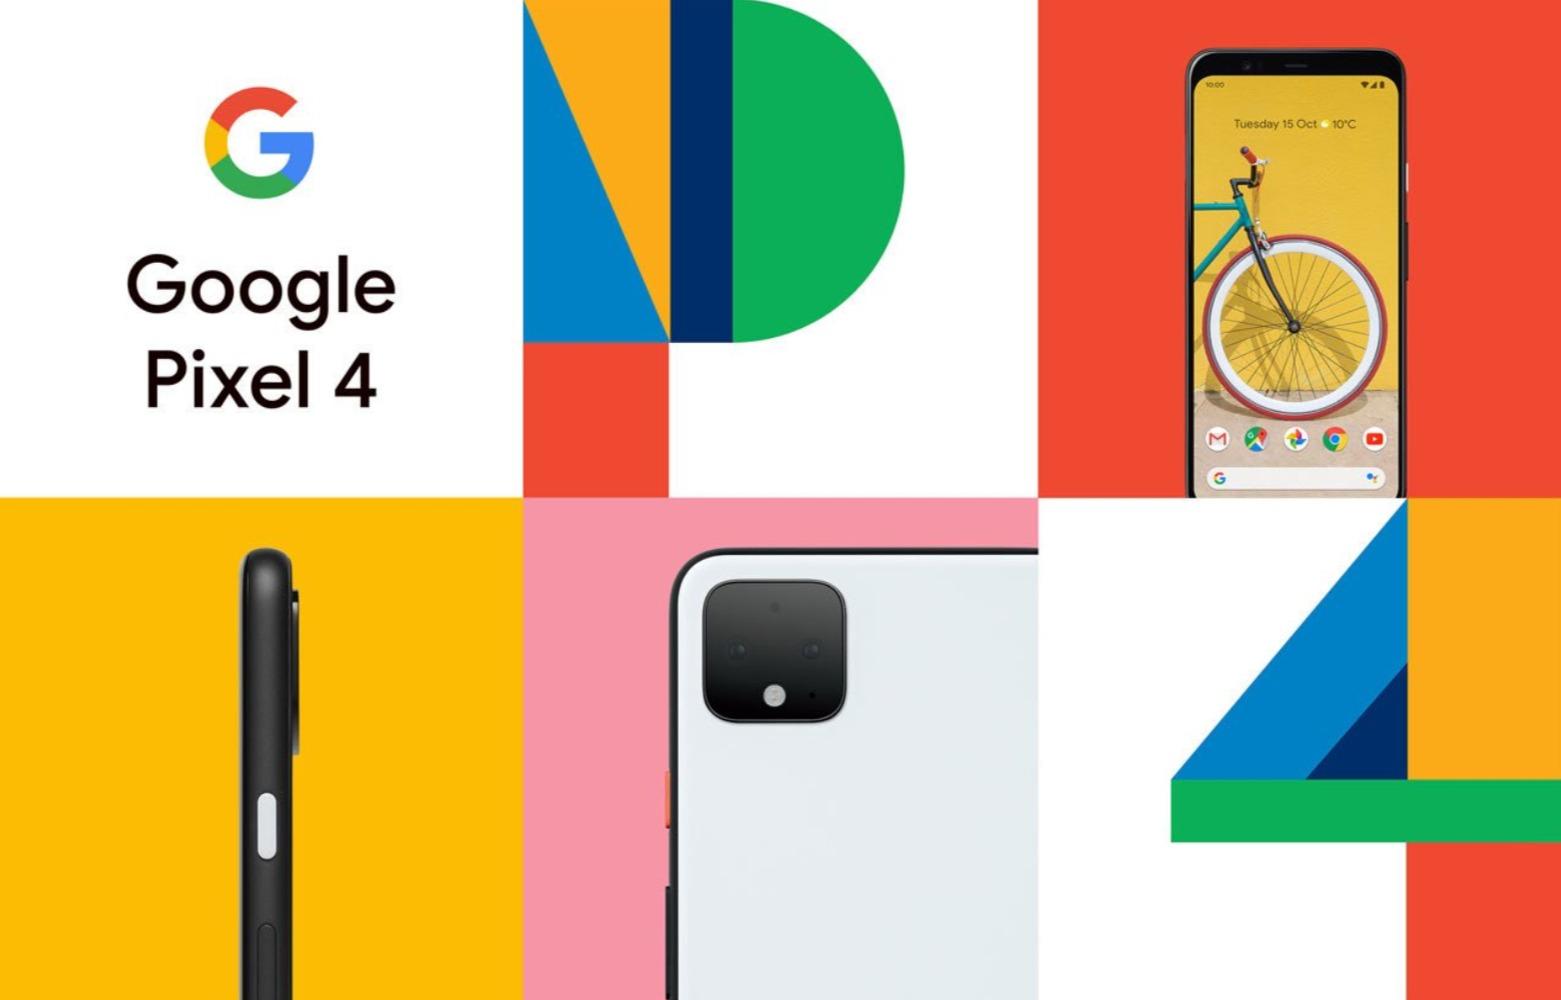 Frühstücksflocken statt Smartphone: Wie cool Google das Pixel 4 verpackt